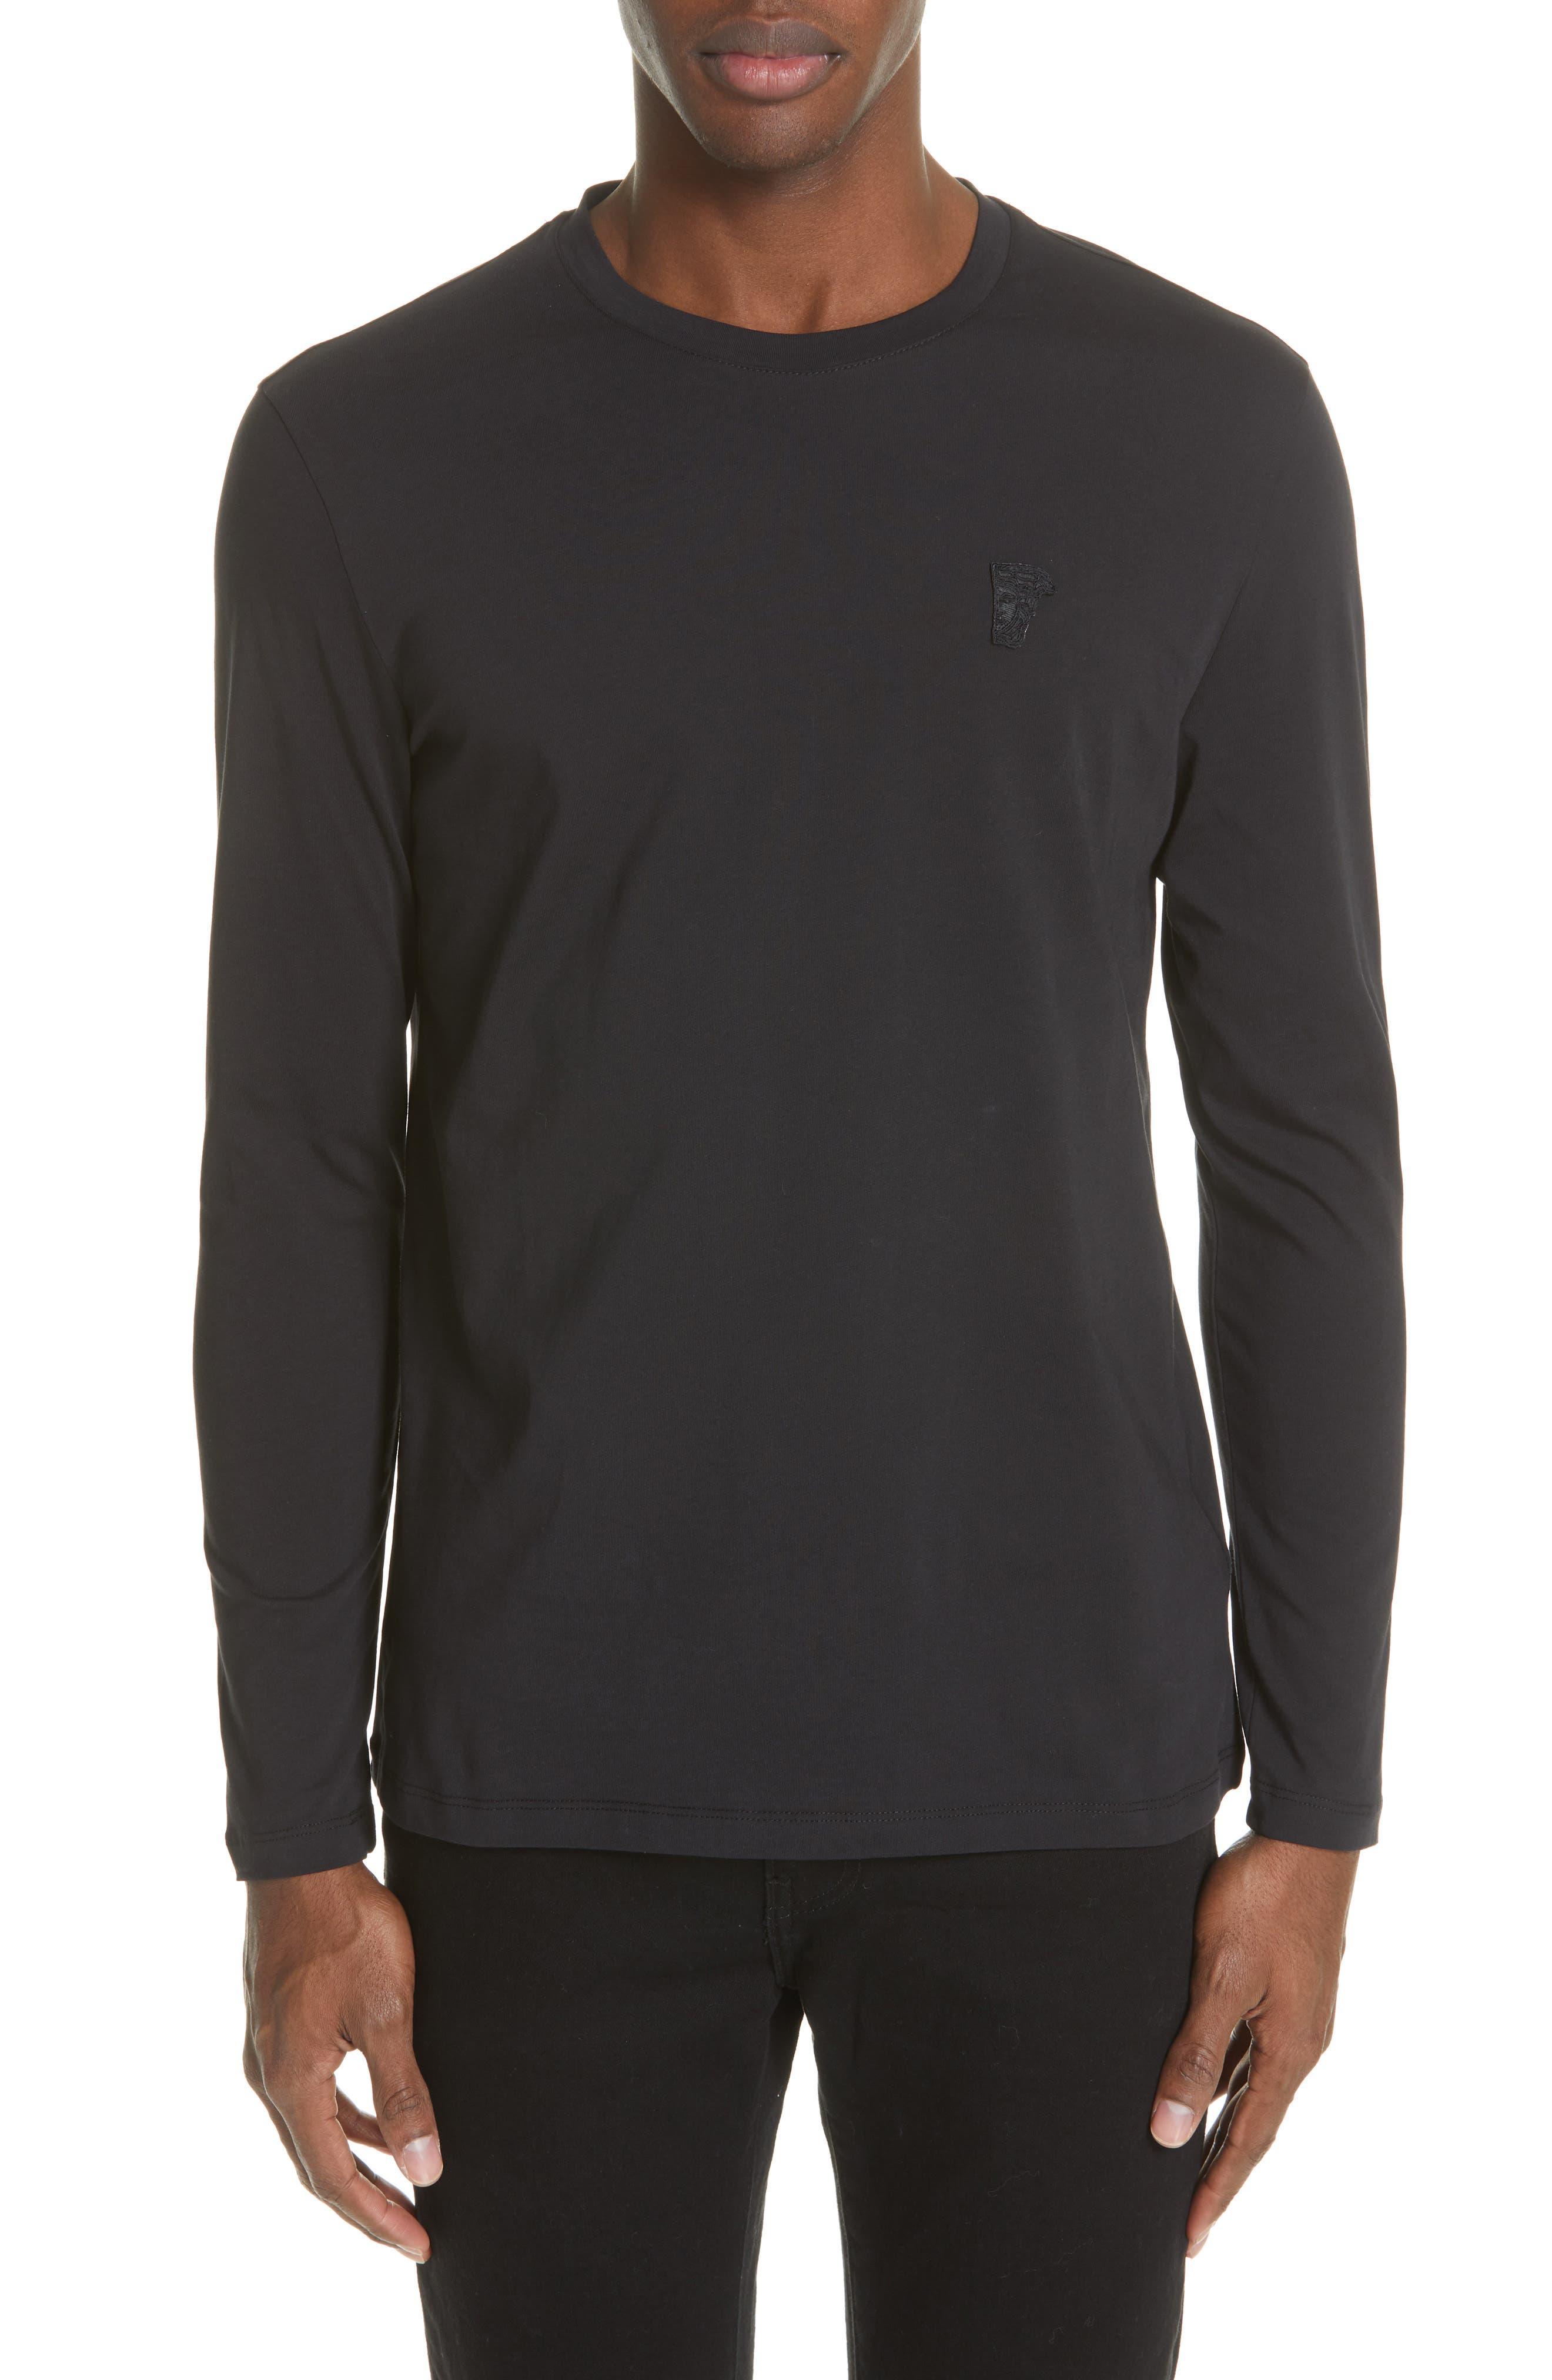 VERSACE COLLECTION Medusa Long Sleeve T-Shirt, Main, color, BLACK